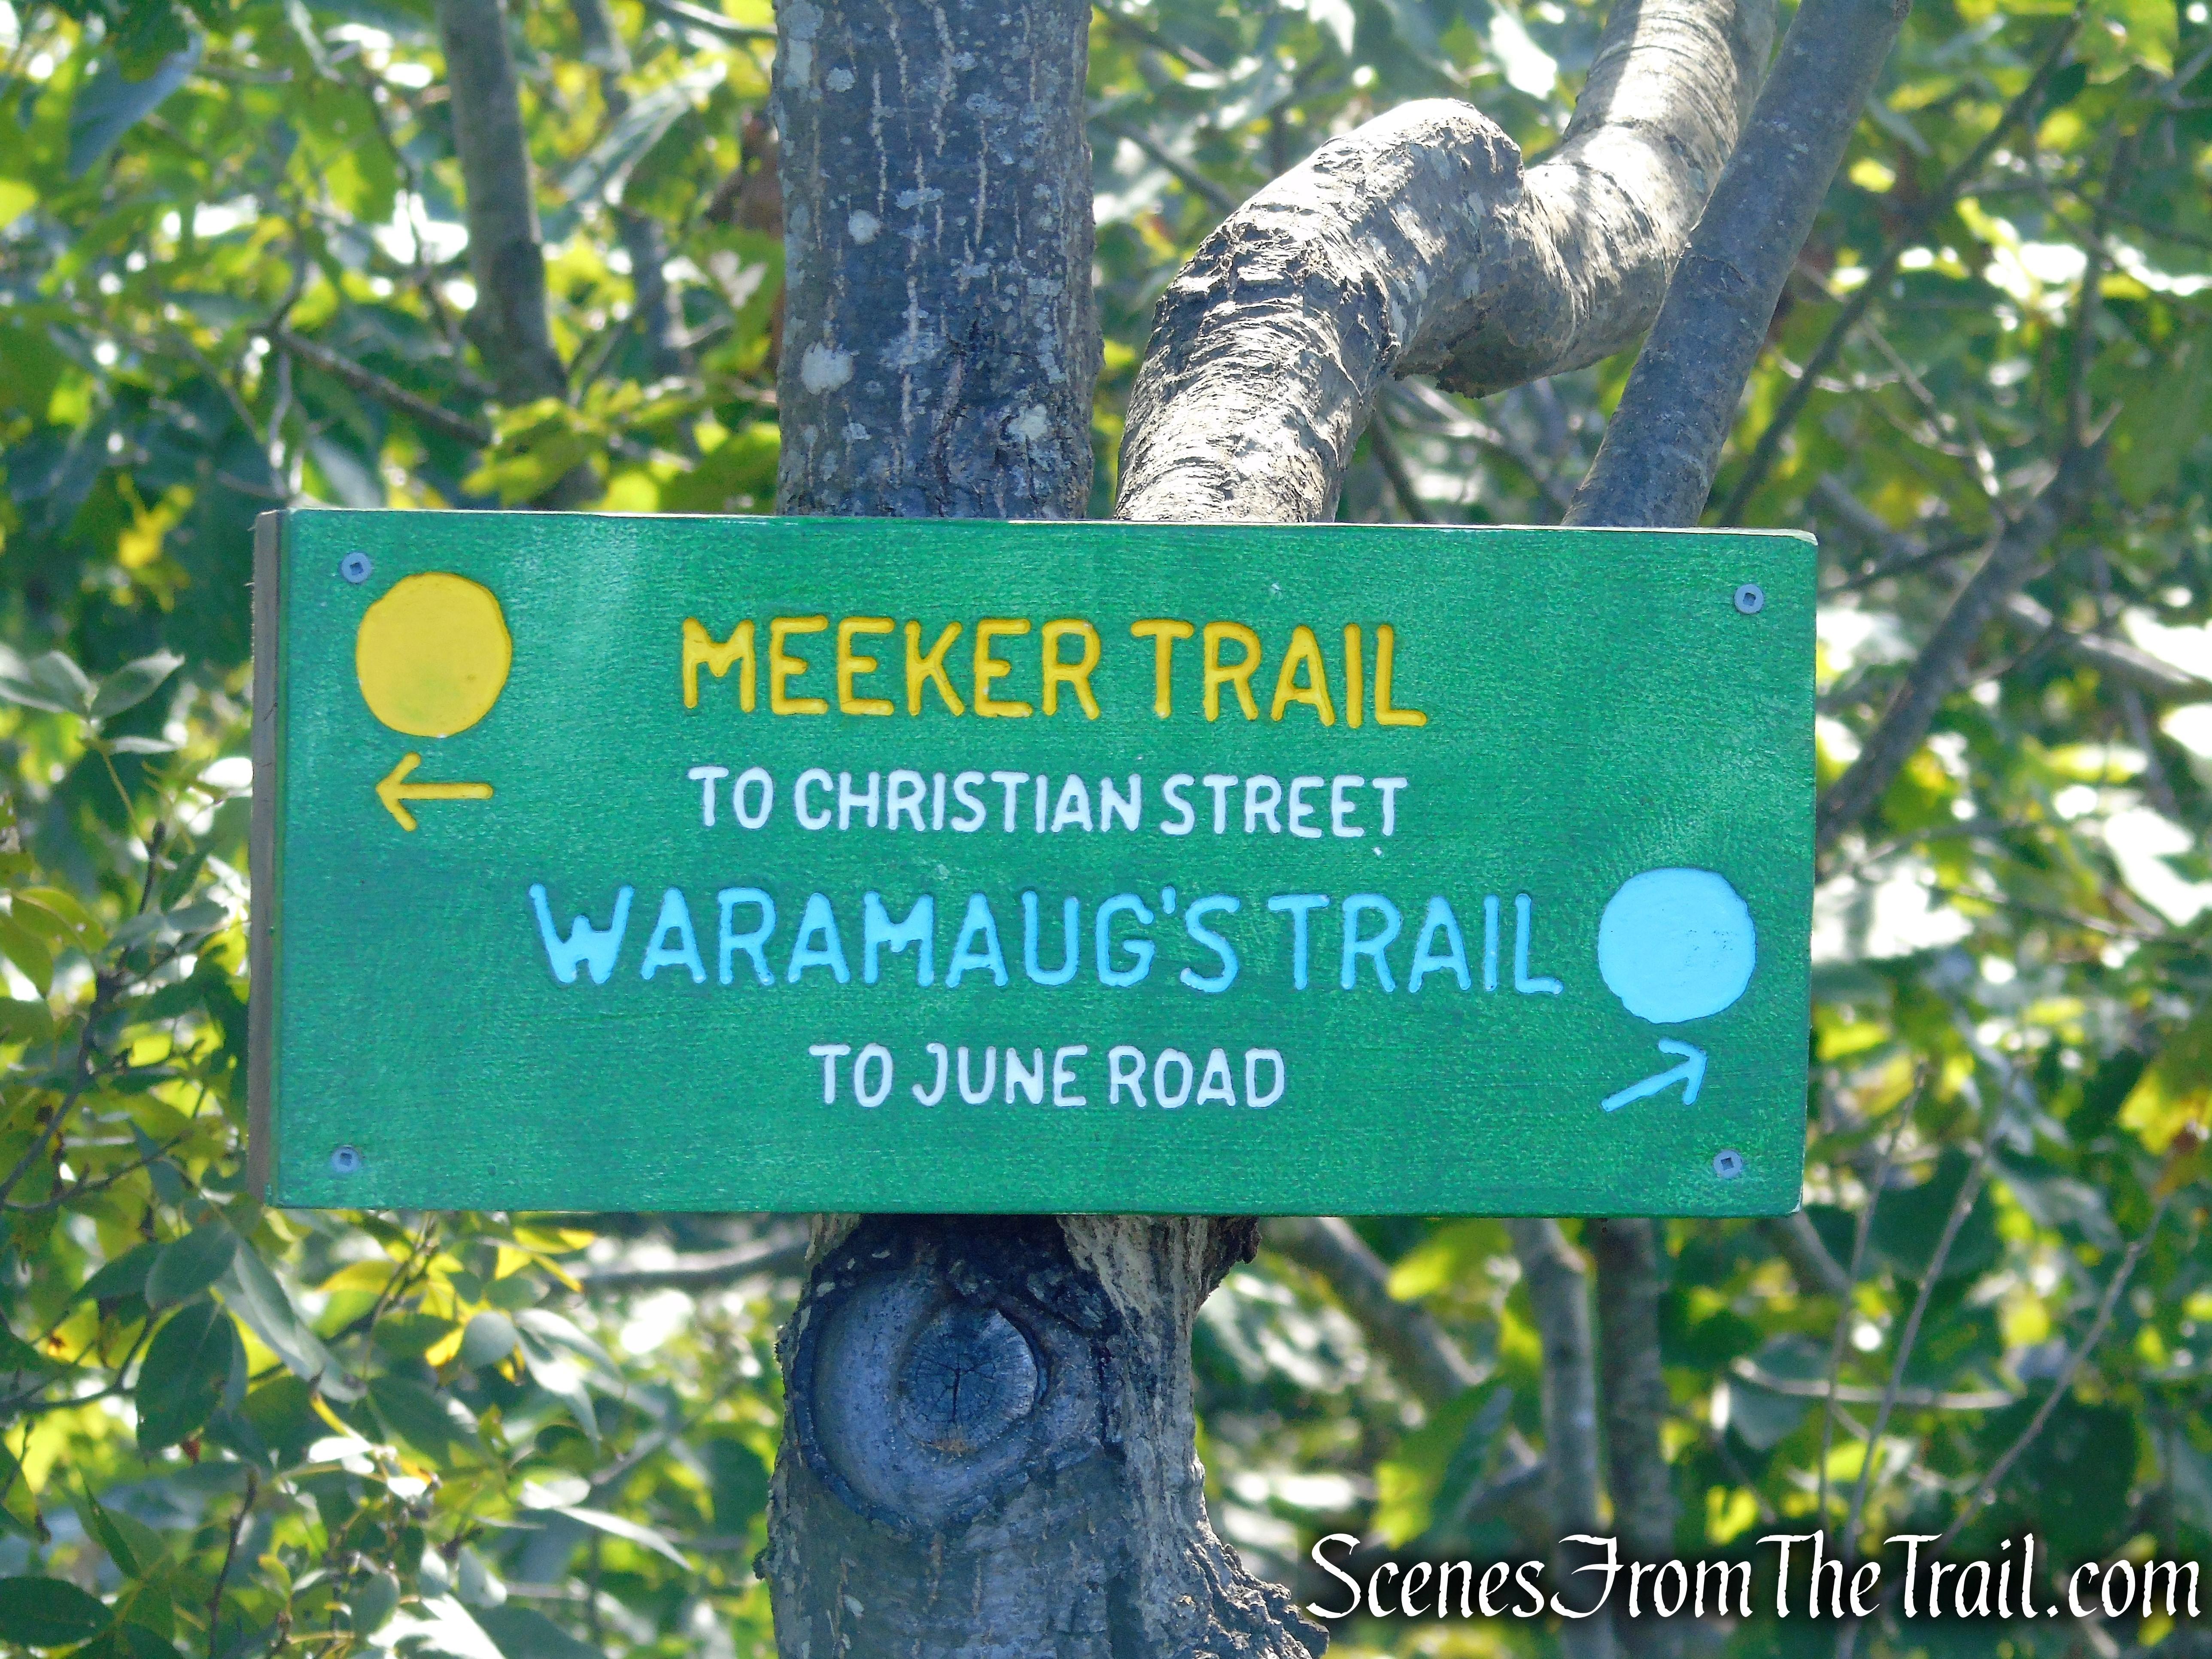 turn left on Meeker Trail